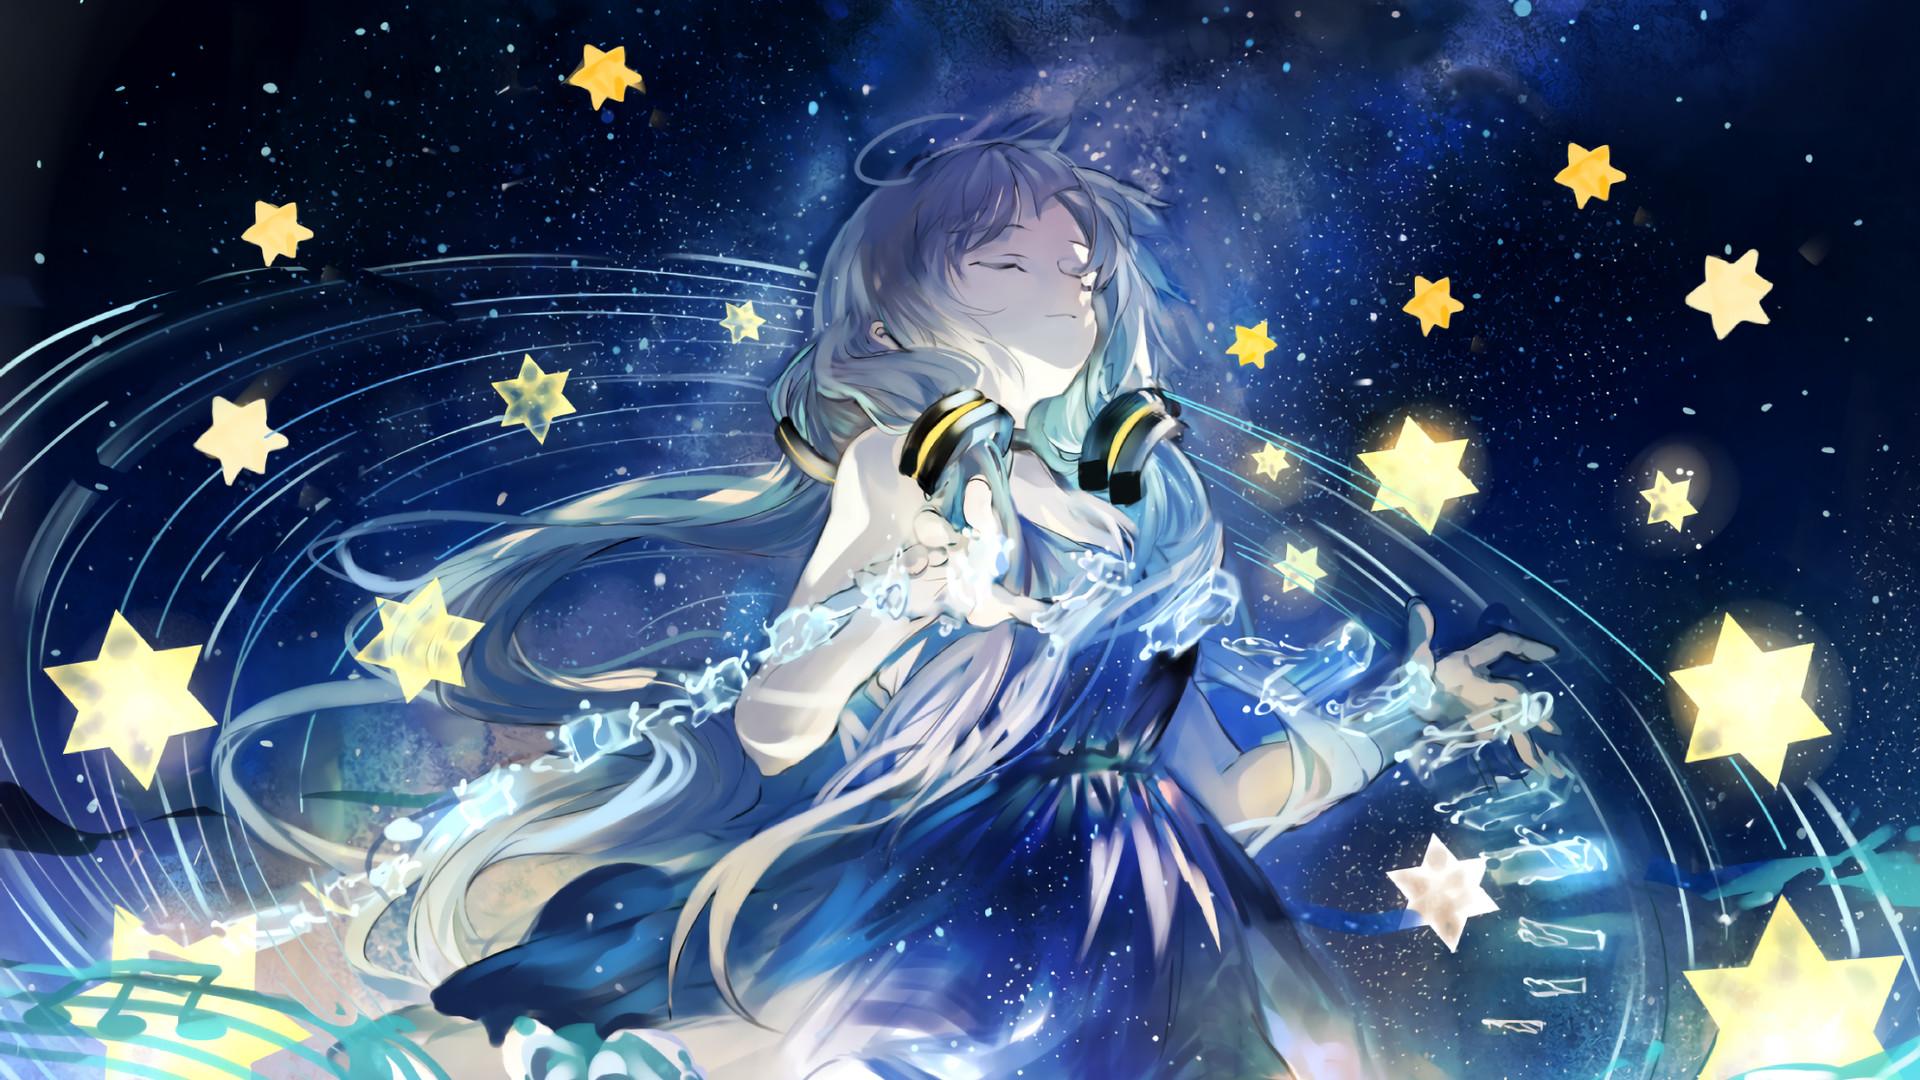 Anime Mermaid Wallpaper (58+ images)